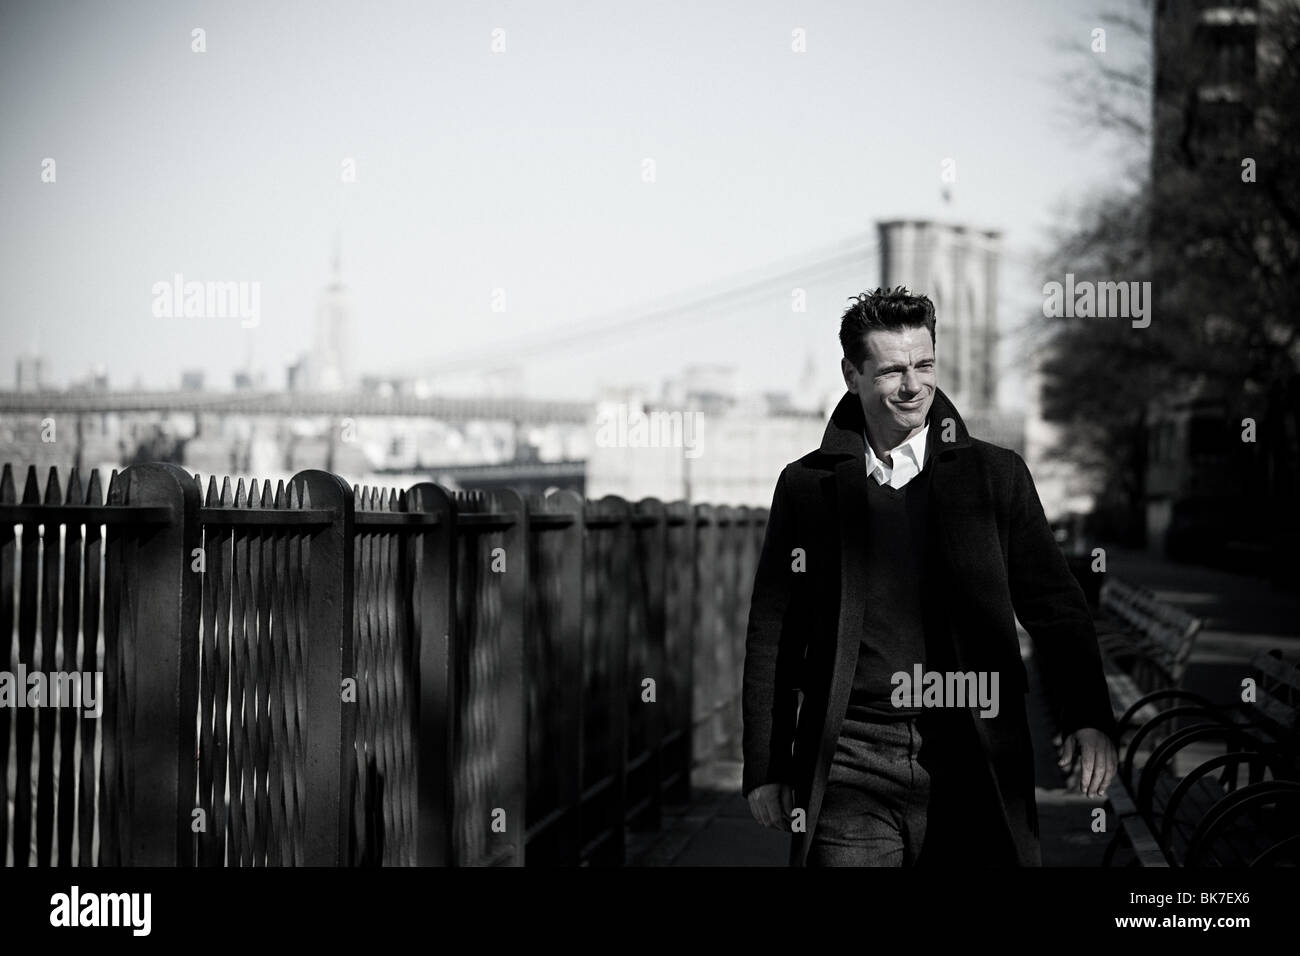 Man walking on brooklyn heights promenade - Stock Image